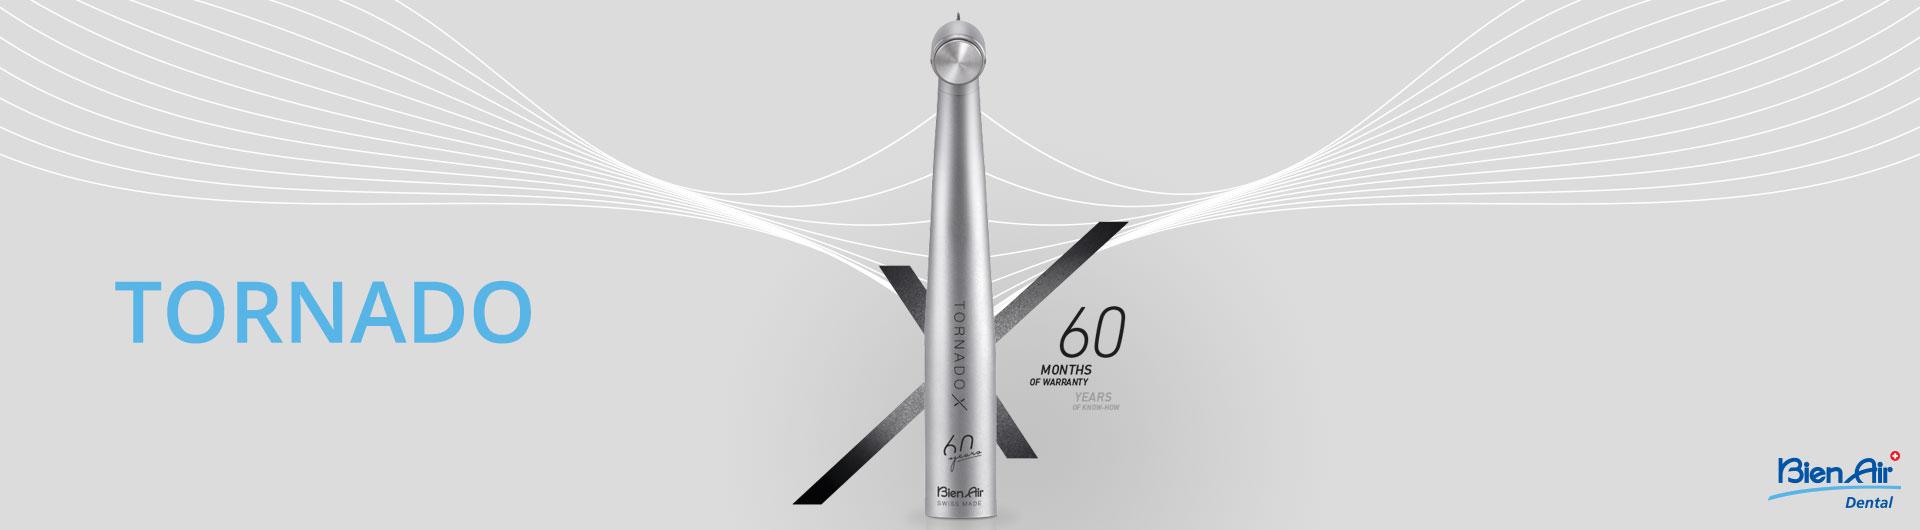 TORNADO X - nova turbina podjetja Bien Air Dental